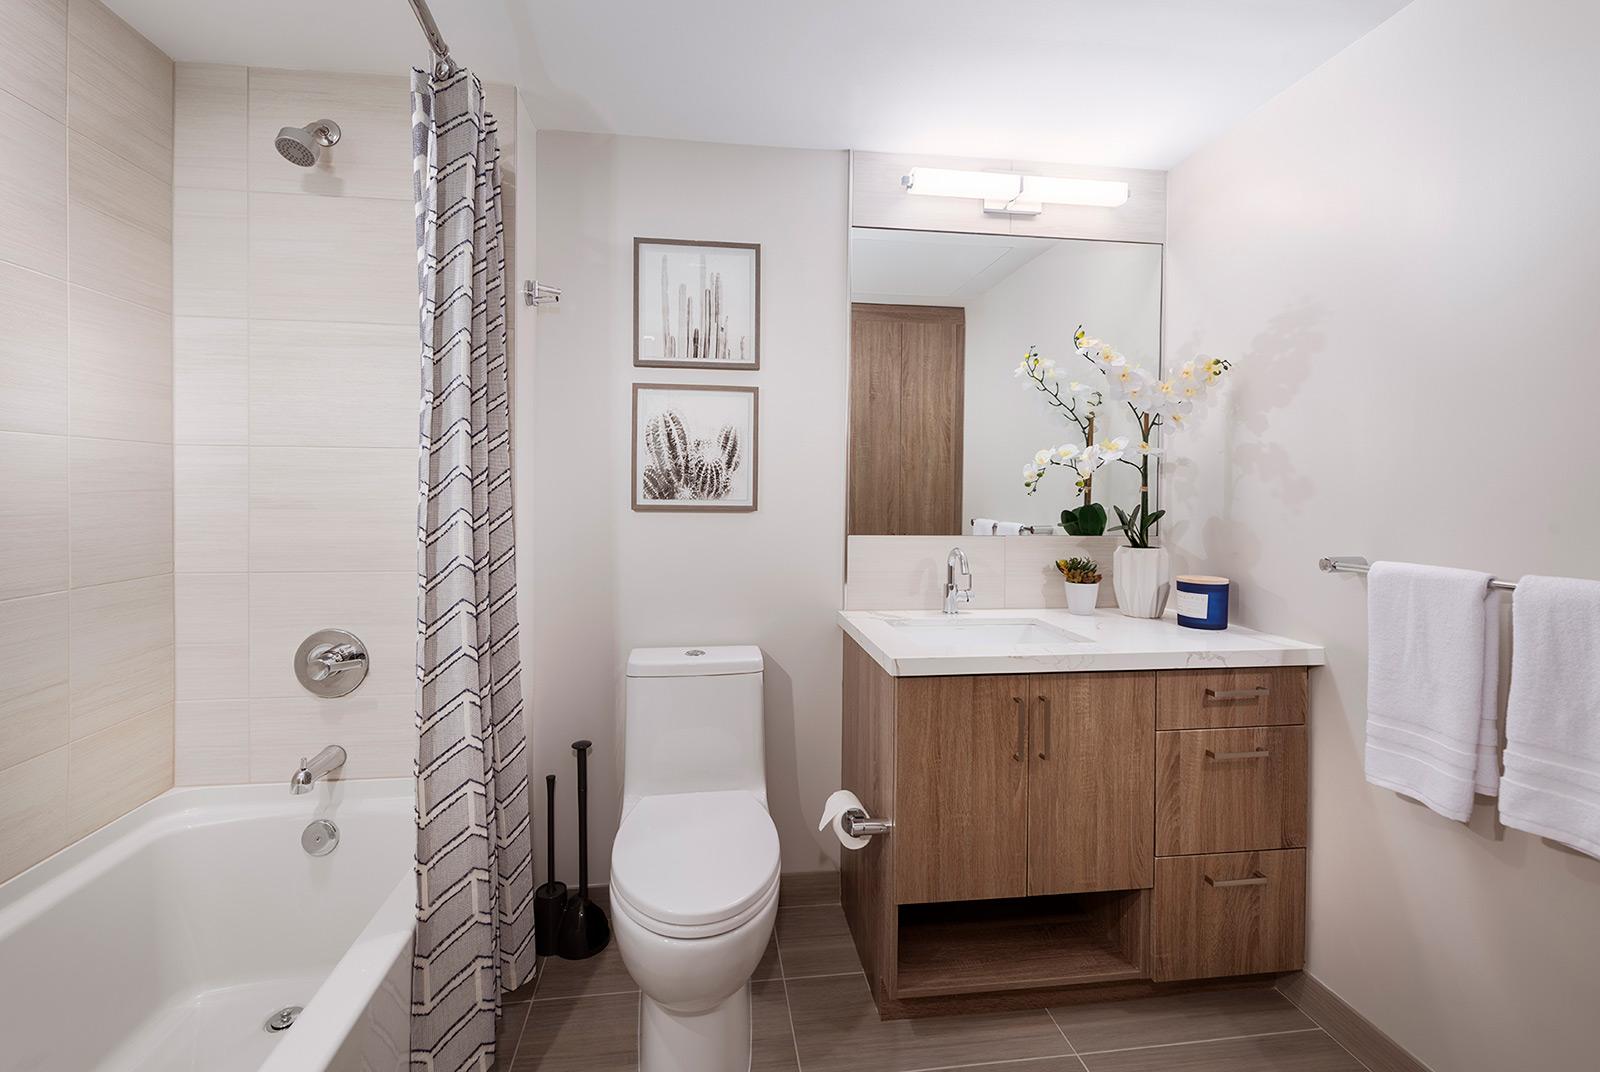 bathroom vanity mirror toilet bathtub shower